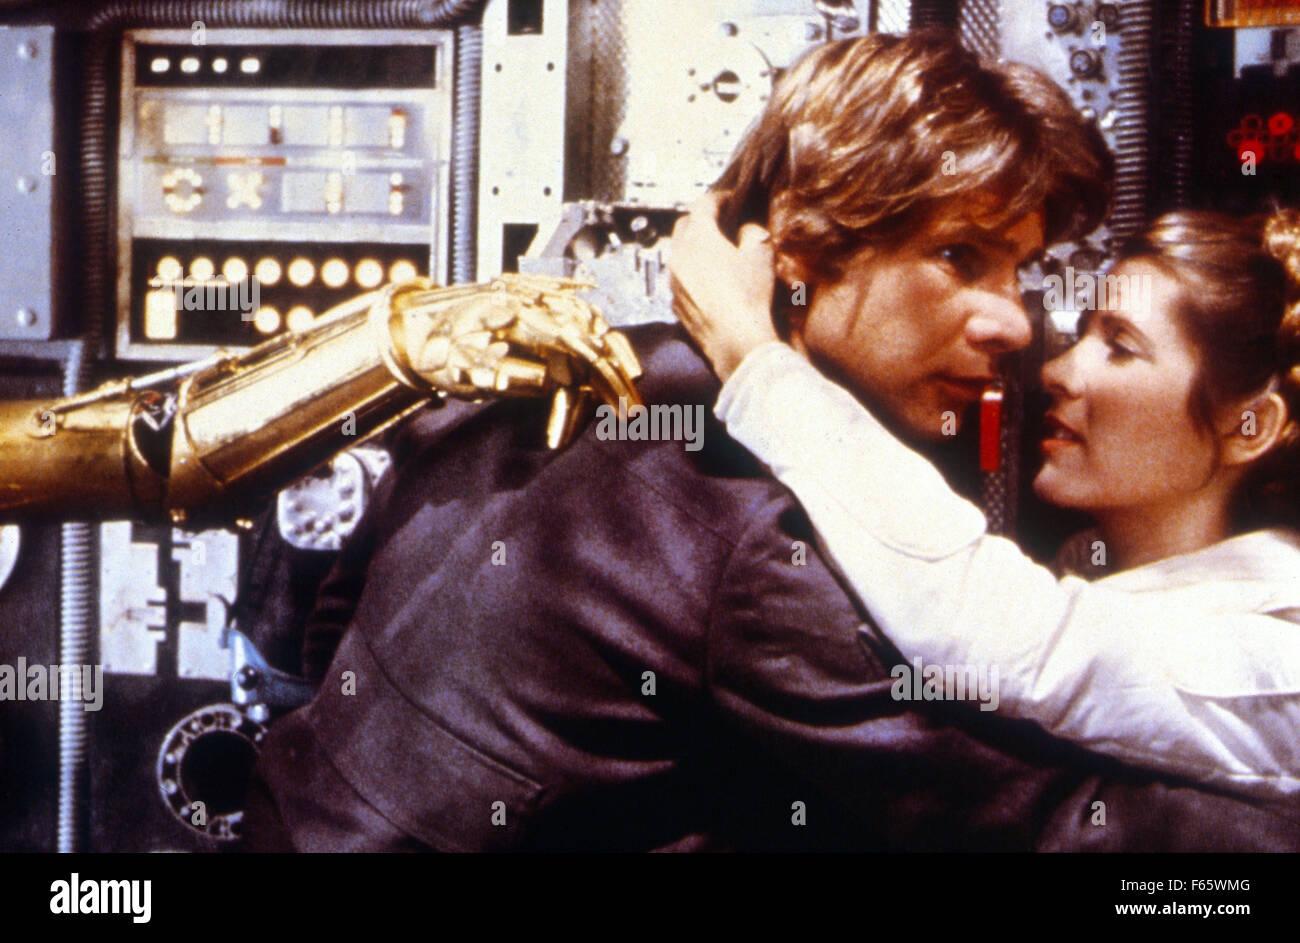 Star Wars: Episode V - The Empire Strikes Back  Year : 1980 USA Director : Irvin Kershner Harrison Ford, Carrie - Stock Image